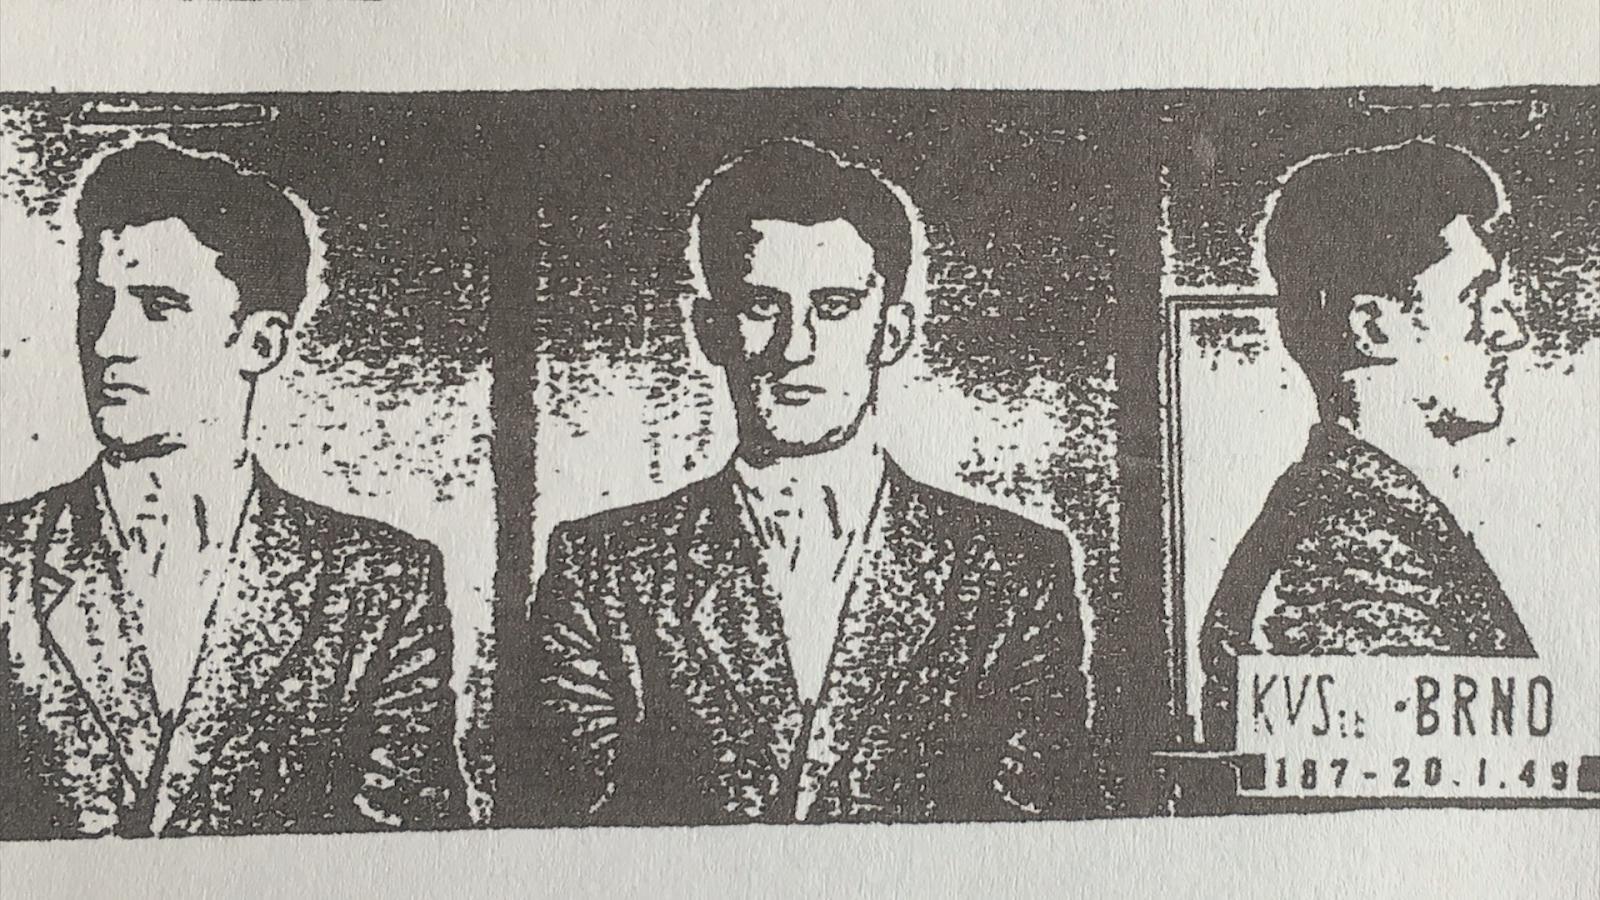 Fotografie Jana Romana z policejního spisu